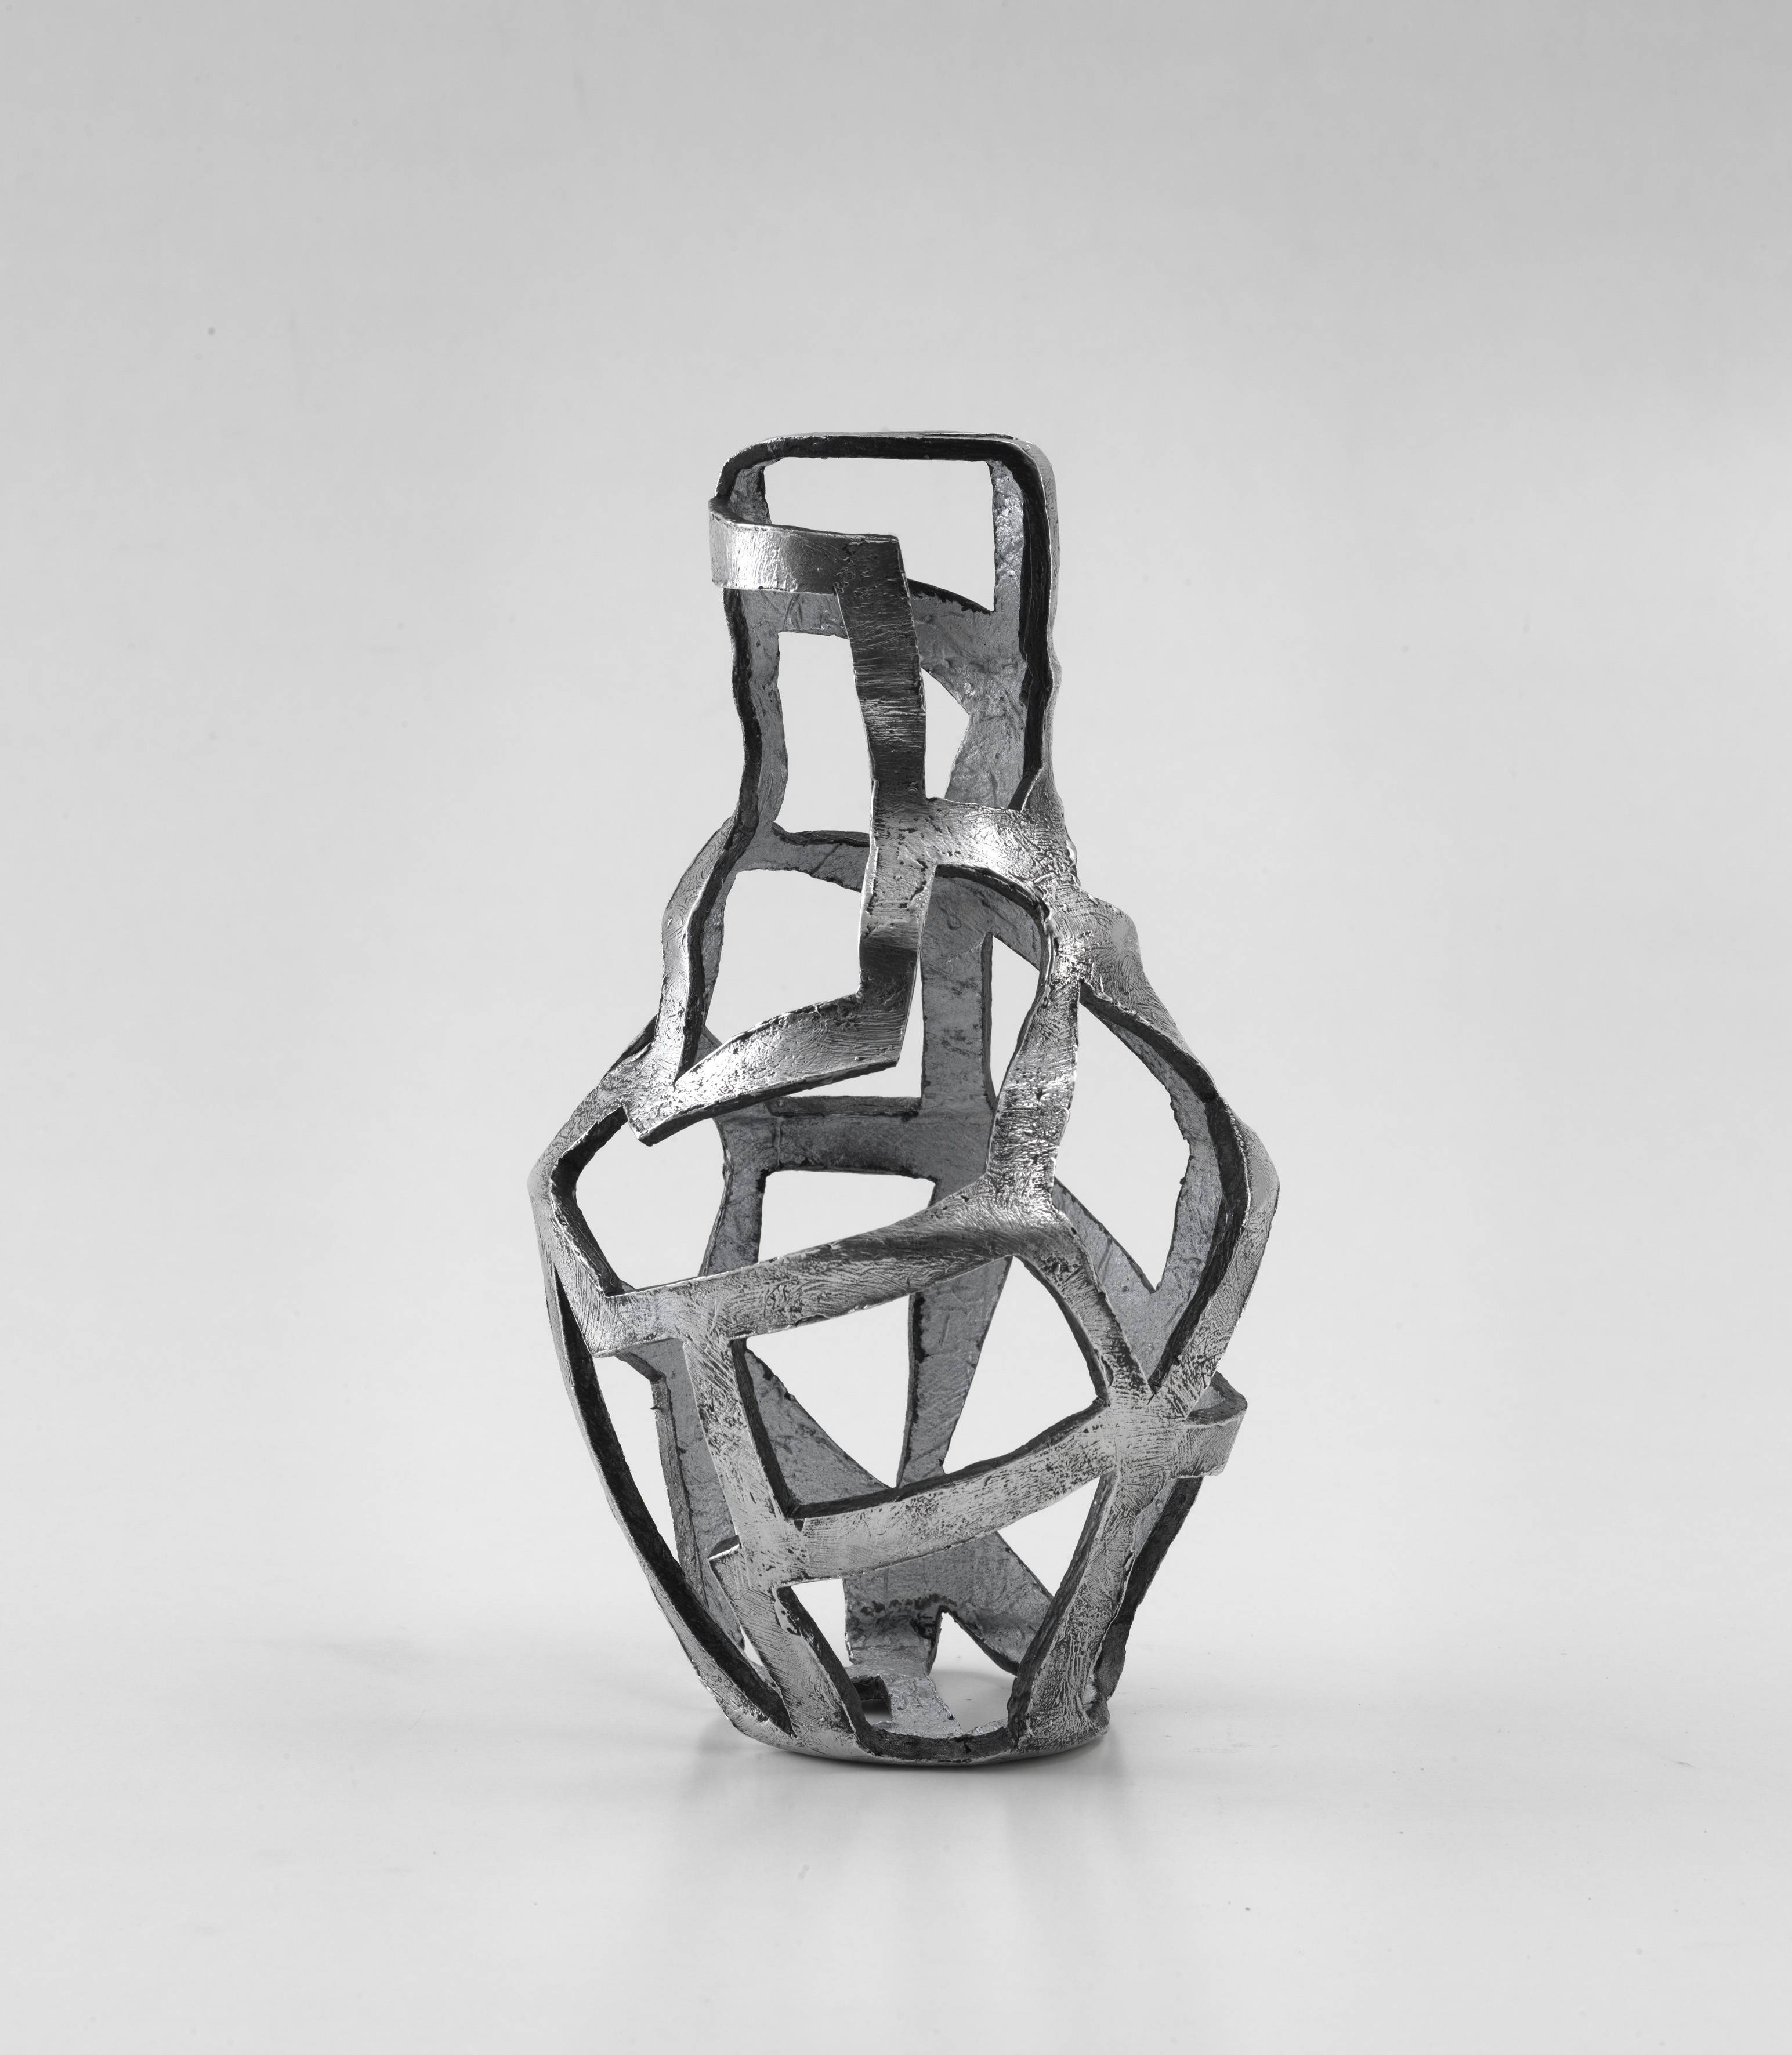 Structure IV (2011) by Susan Hefuna, Aluminium